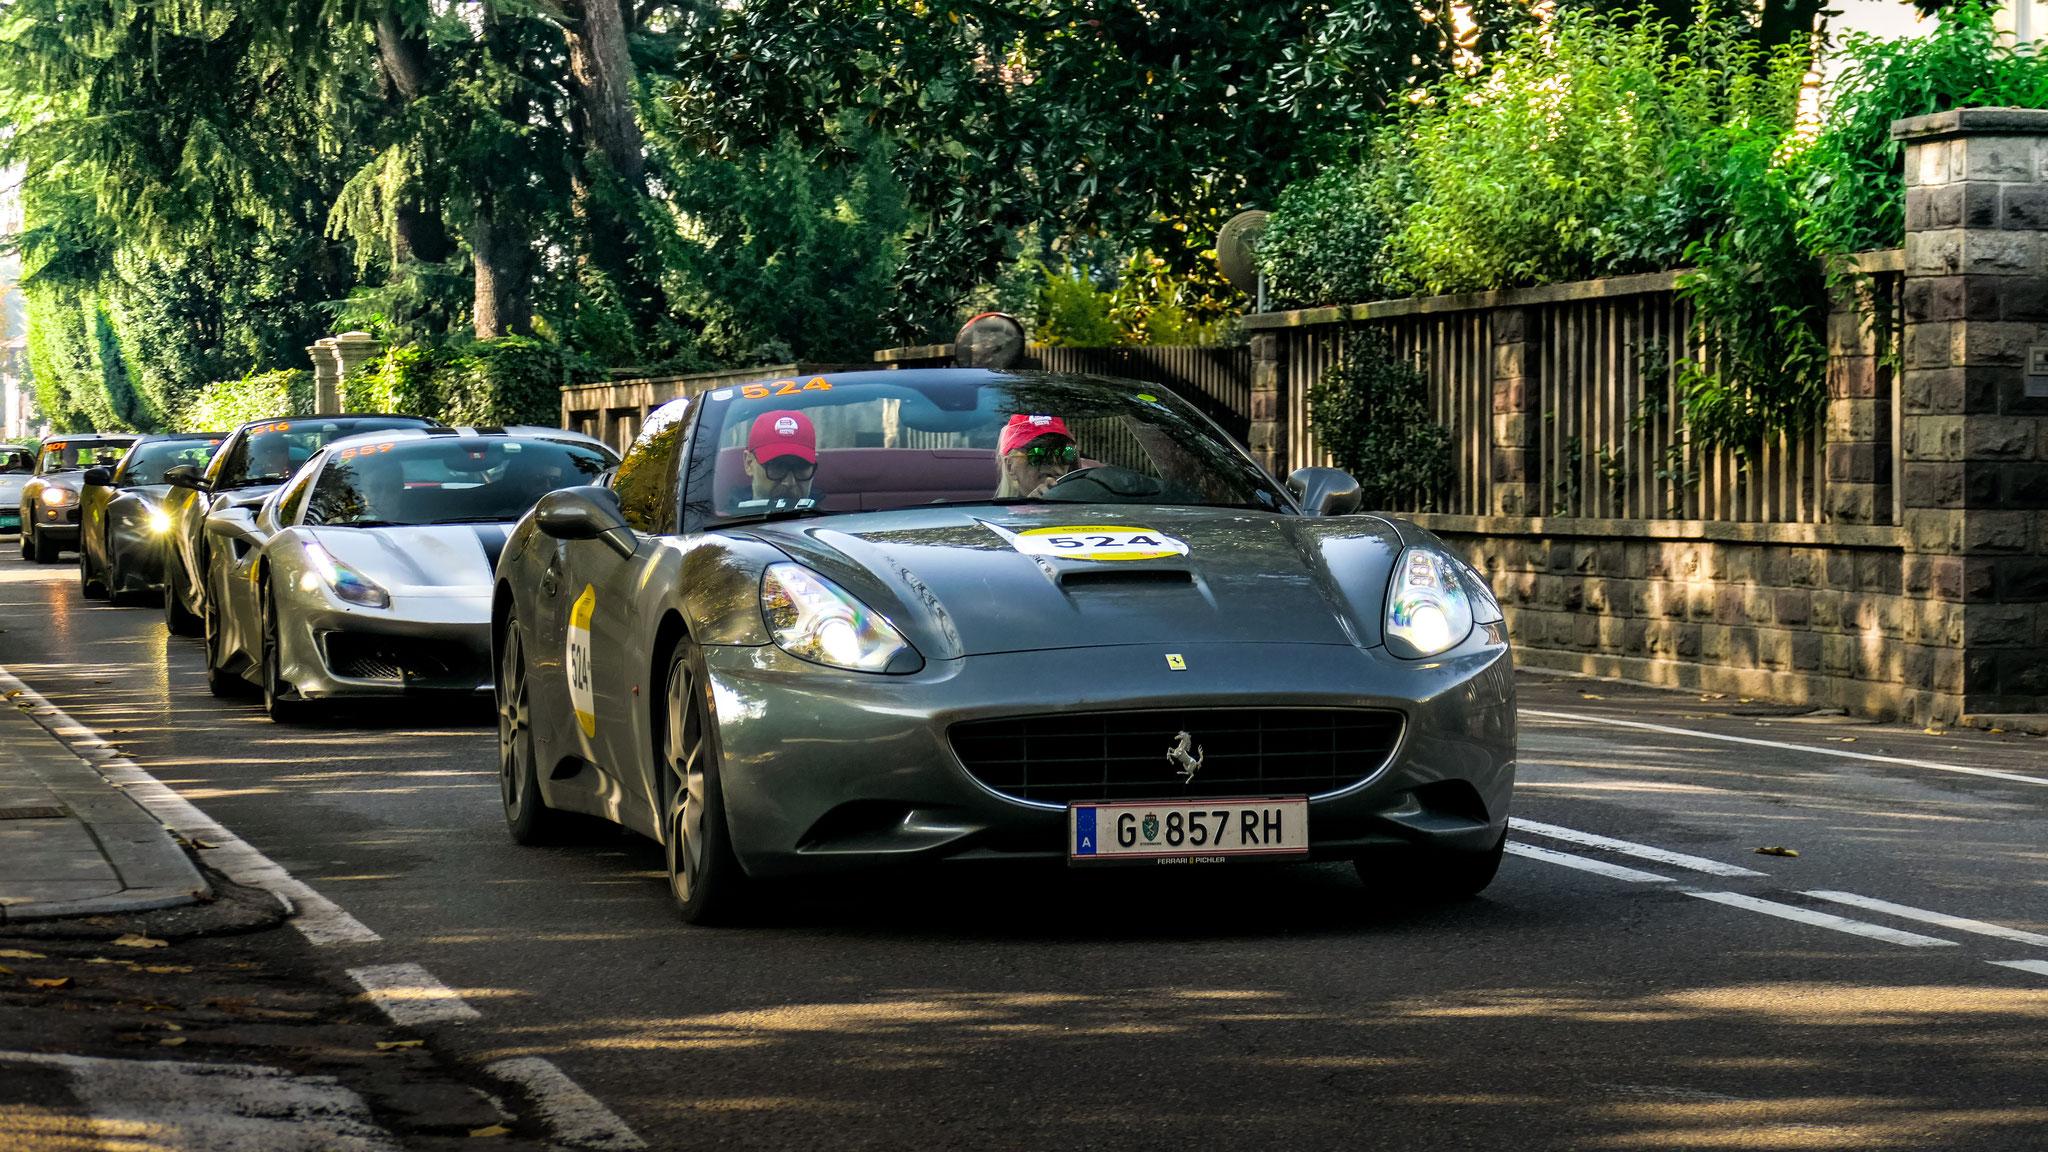 Ferrari California - G-857-RH (AUT)